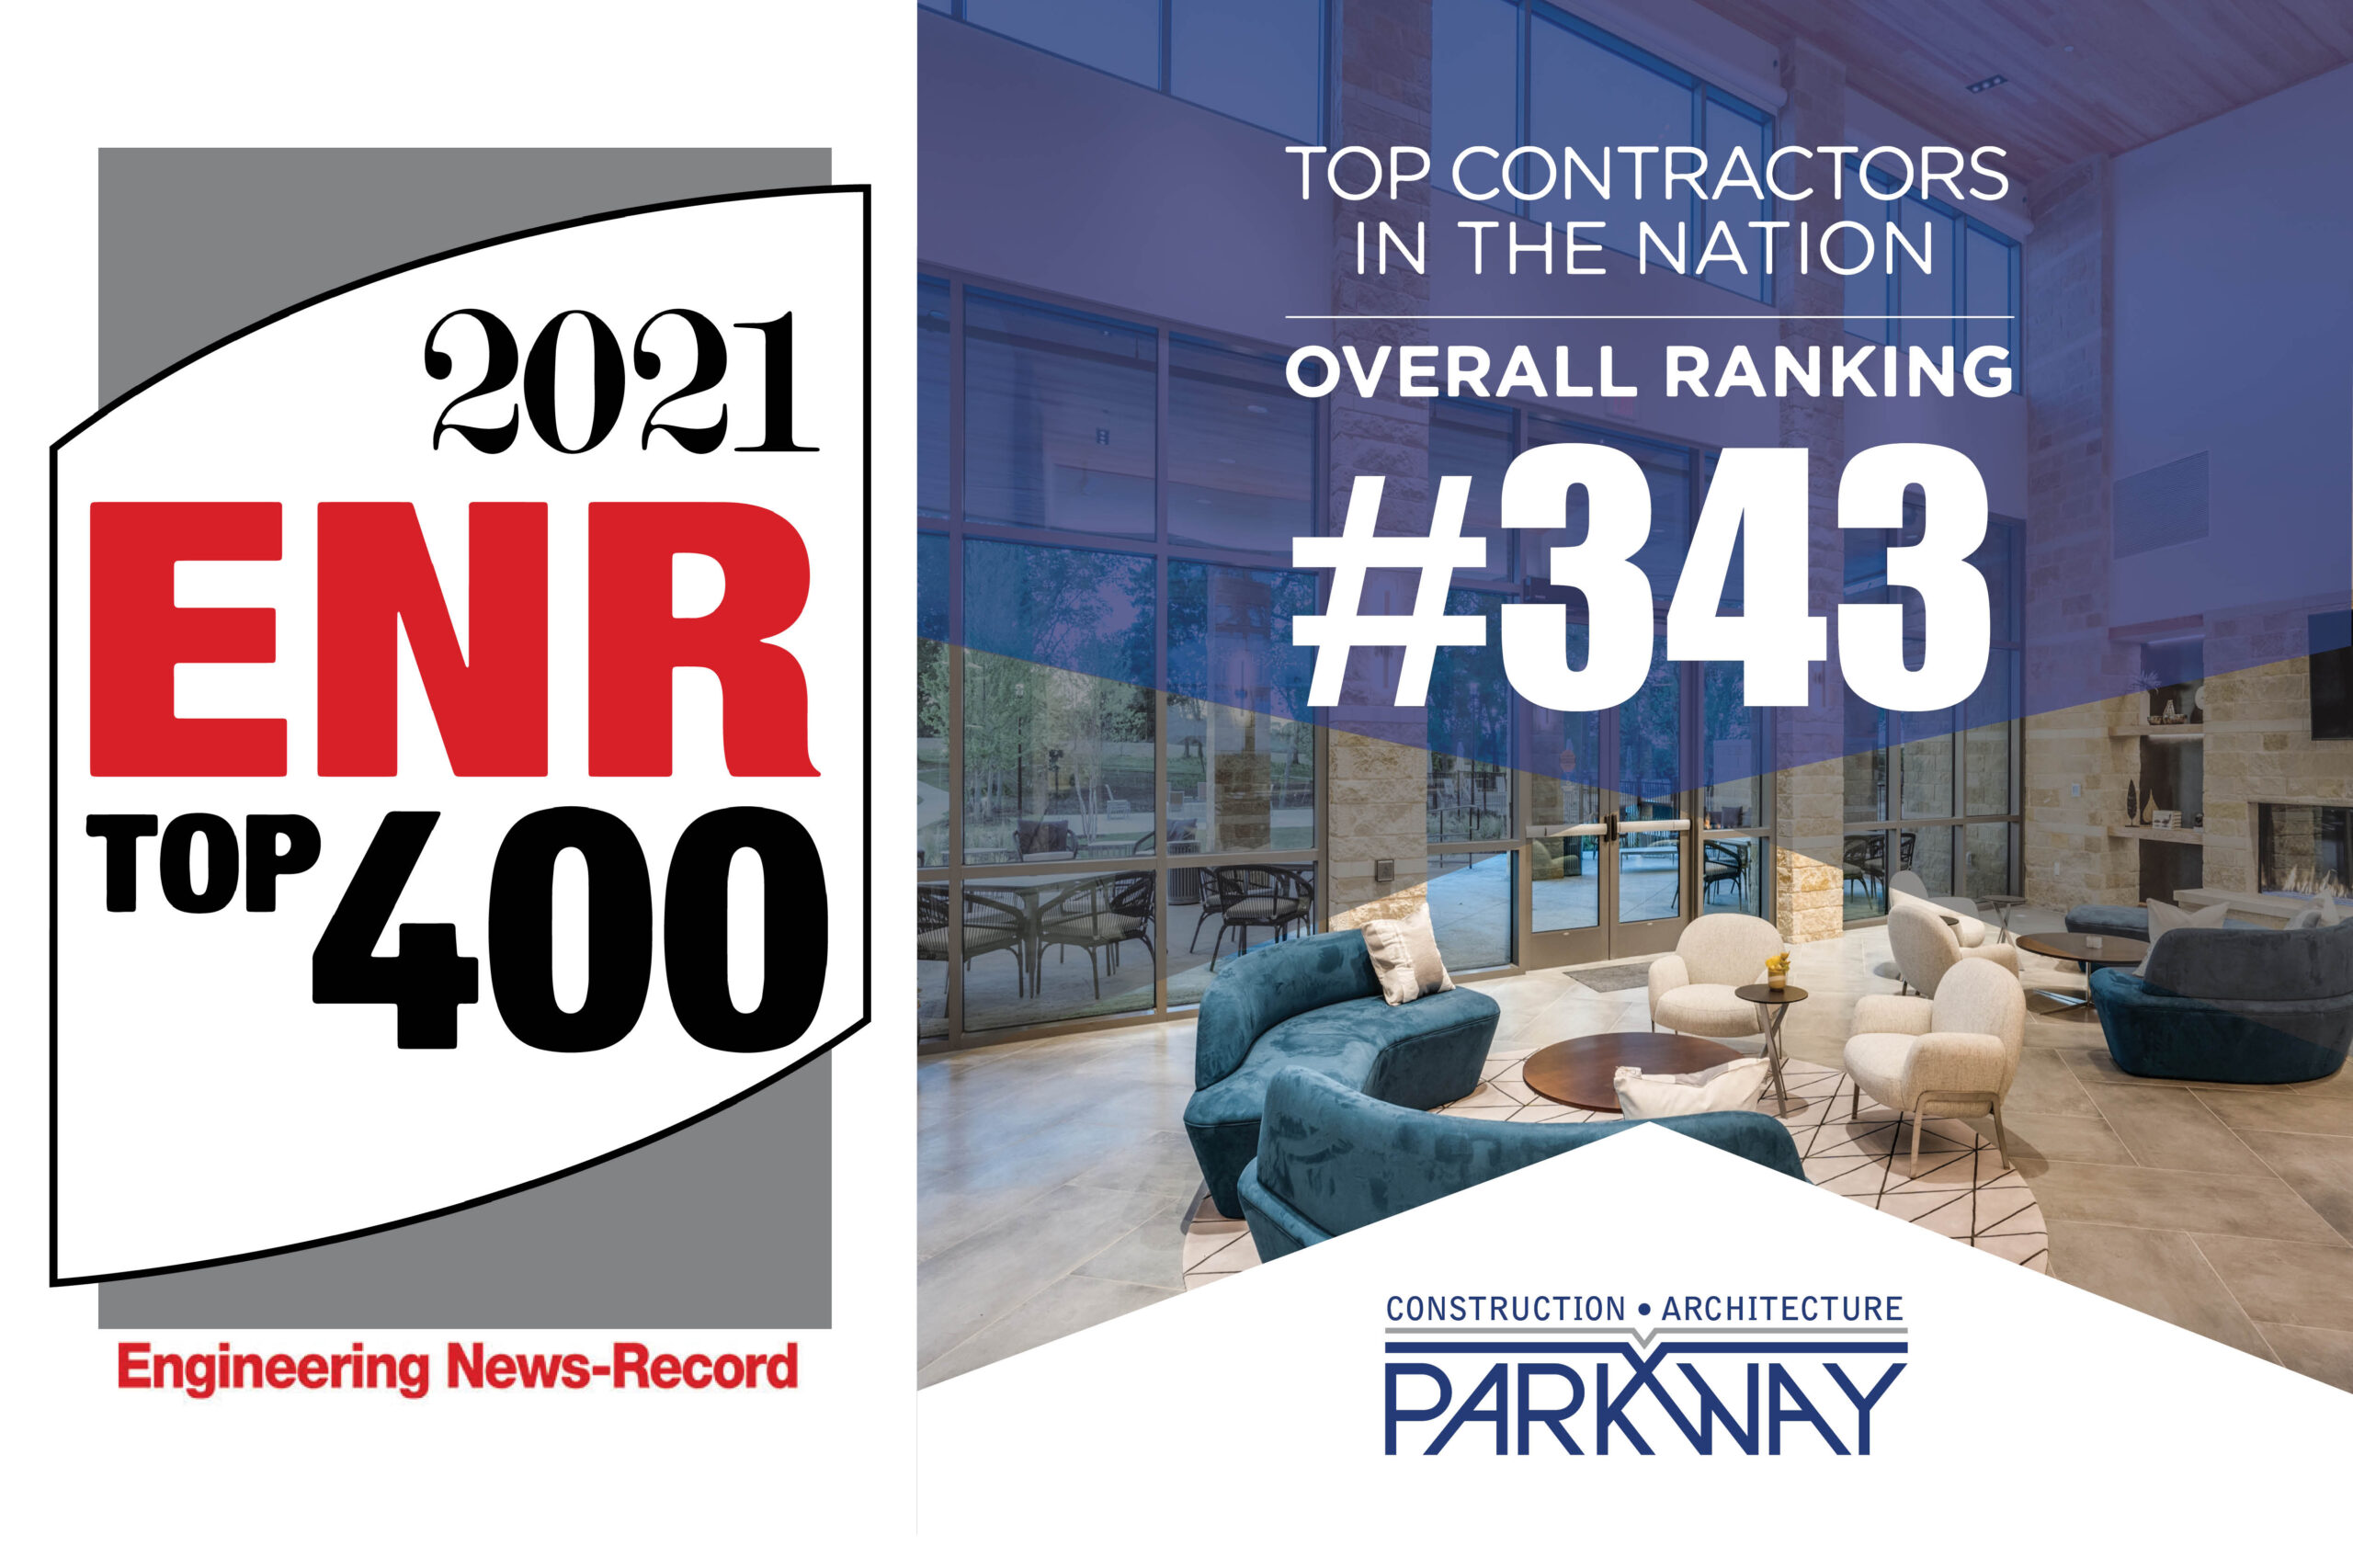 Parkway C&A, LP Named Top Contractor in ENR Top 400 List